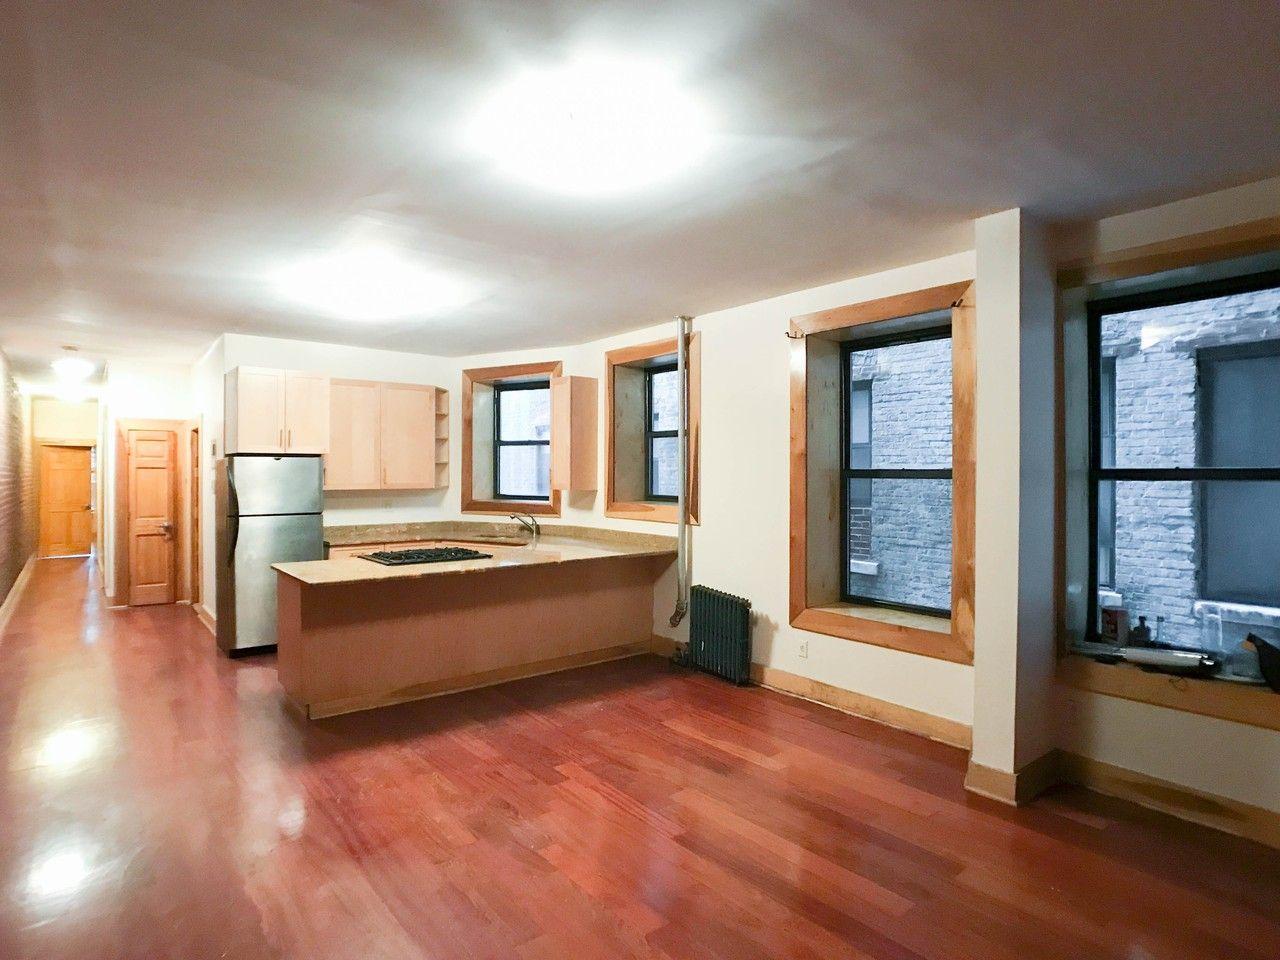 Esplanade Gardens Plaza W 140th St 24 New York Ny 10030 3 Bedroom Apartment For Rent Padmapper